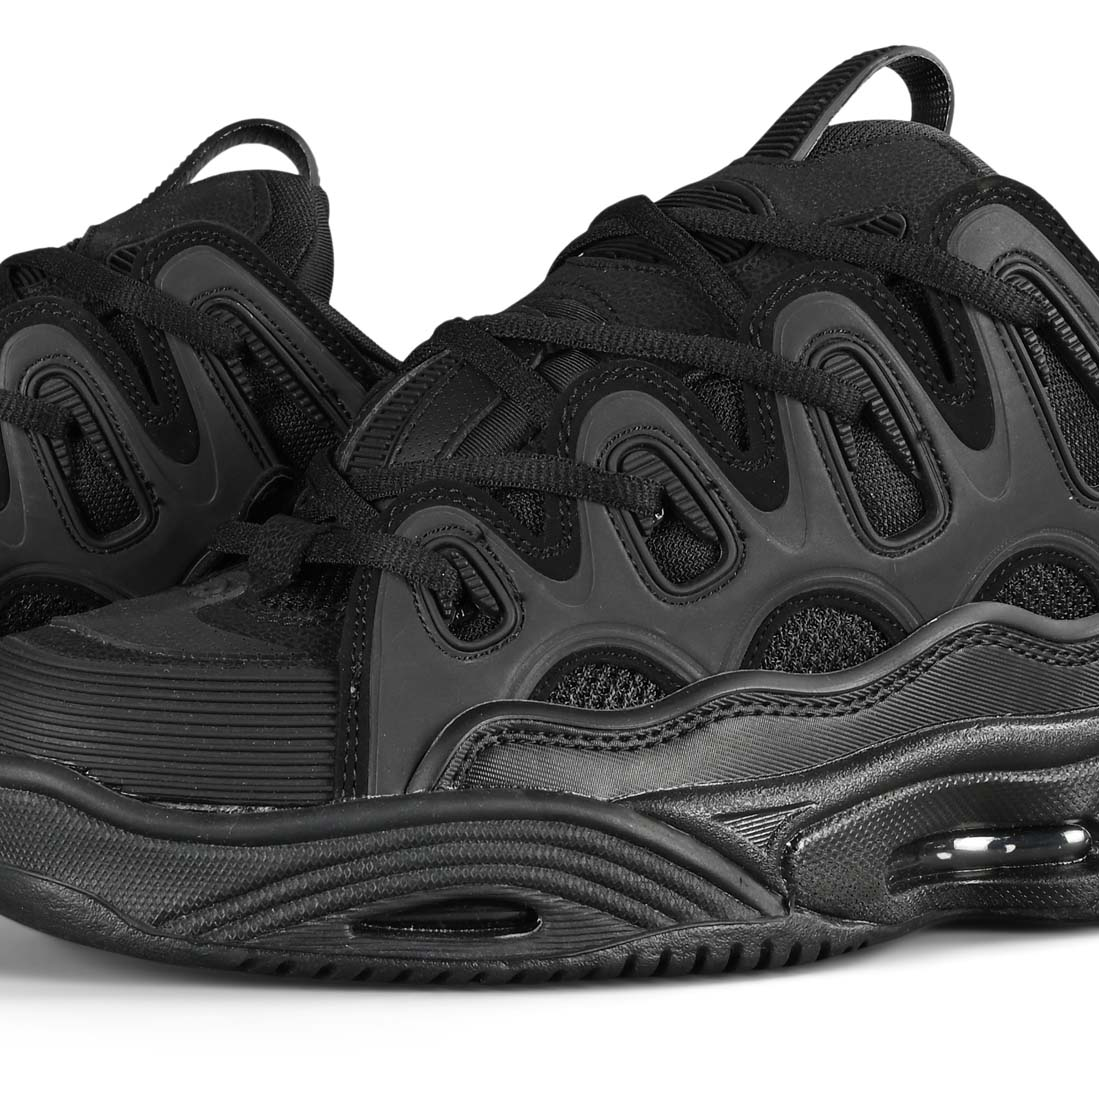 Osiris D3 2001 Skate Shoes - Black